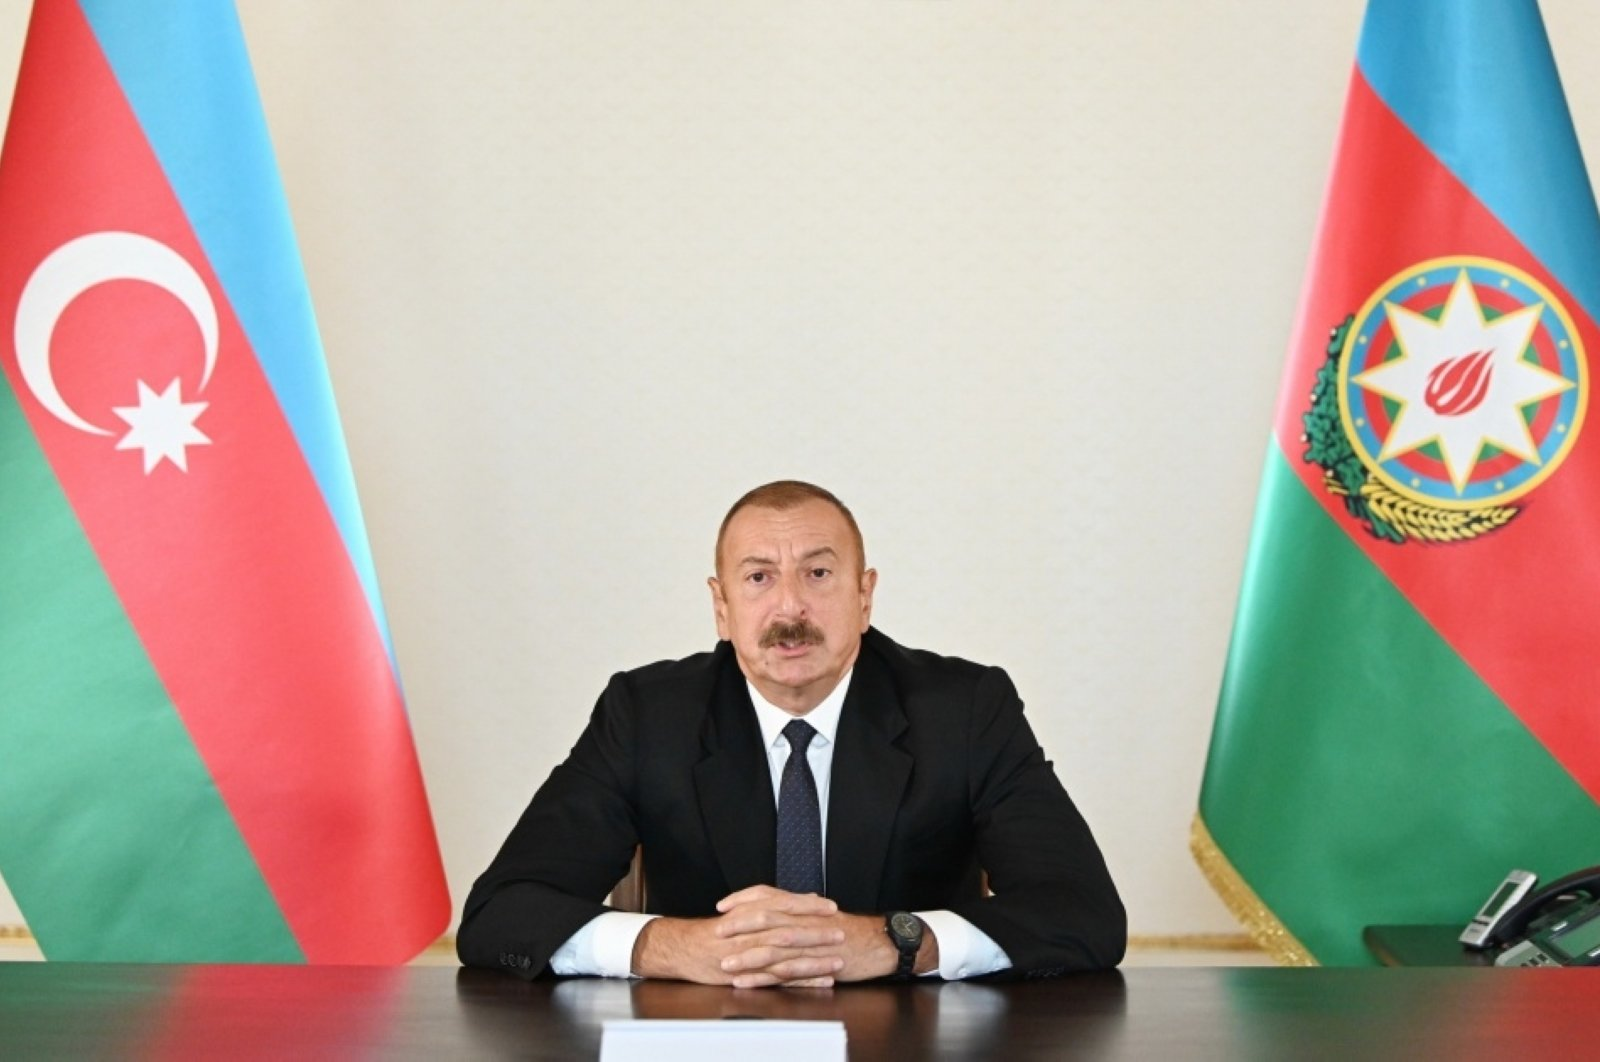 Azerbaijani President Ilham Aliyev makes a statement on the current conflict with Armenia, in Azerbaijan, Sept. 27, 2020. (Azerbaijan Defense Ministry handout)